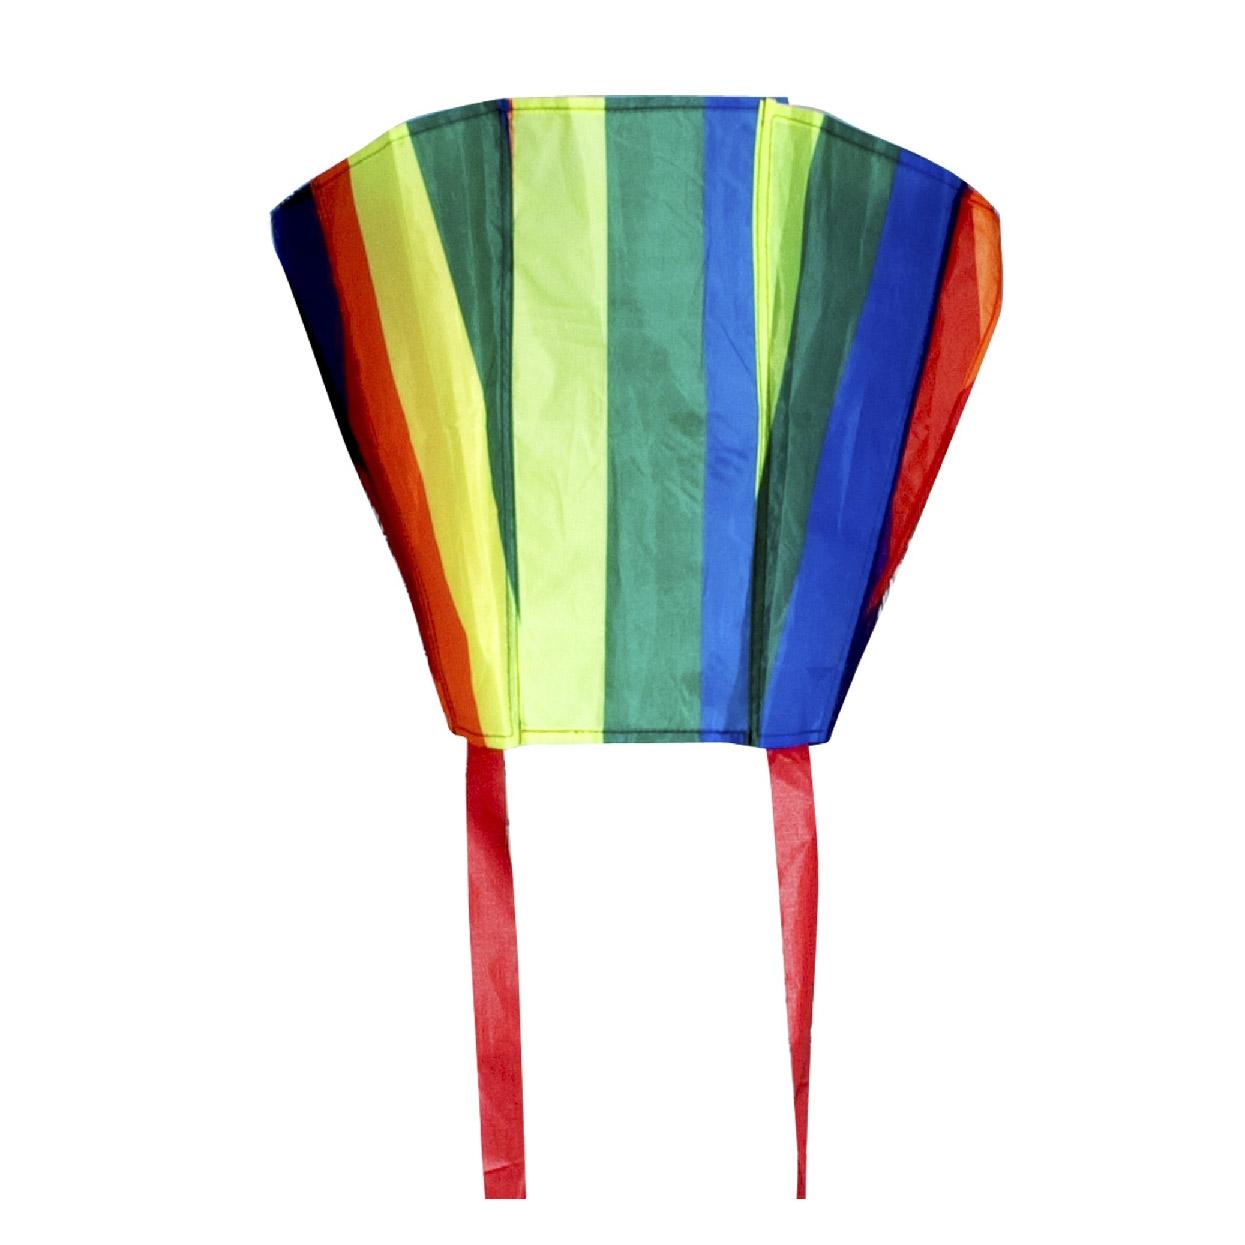 Billede af Rainbow mini drage - Rhombus